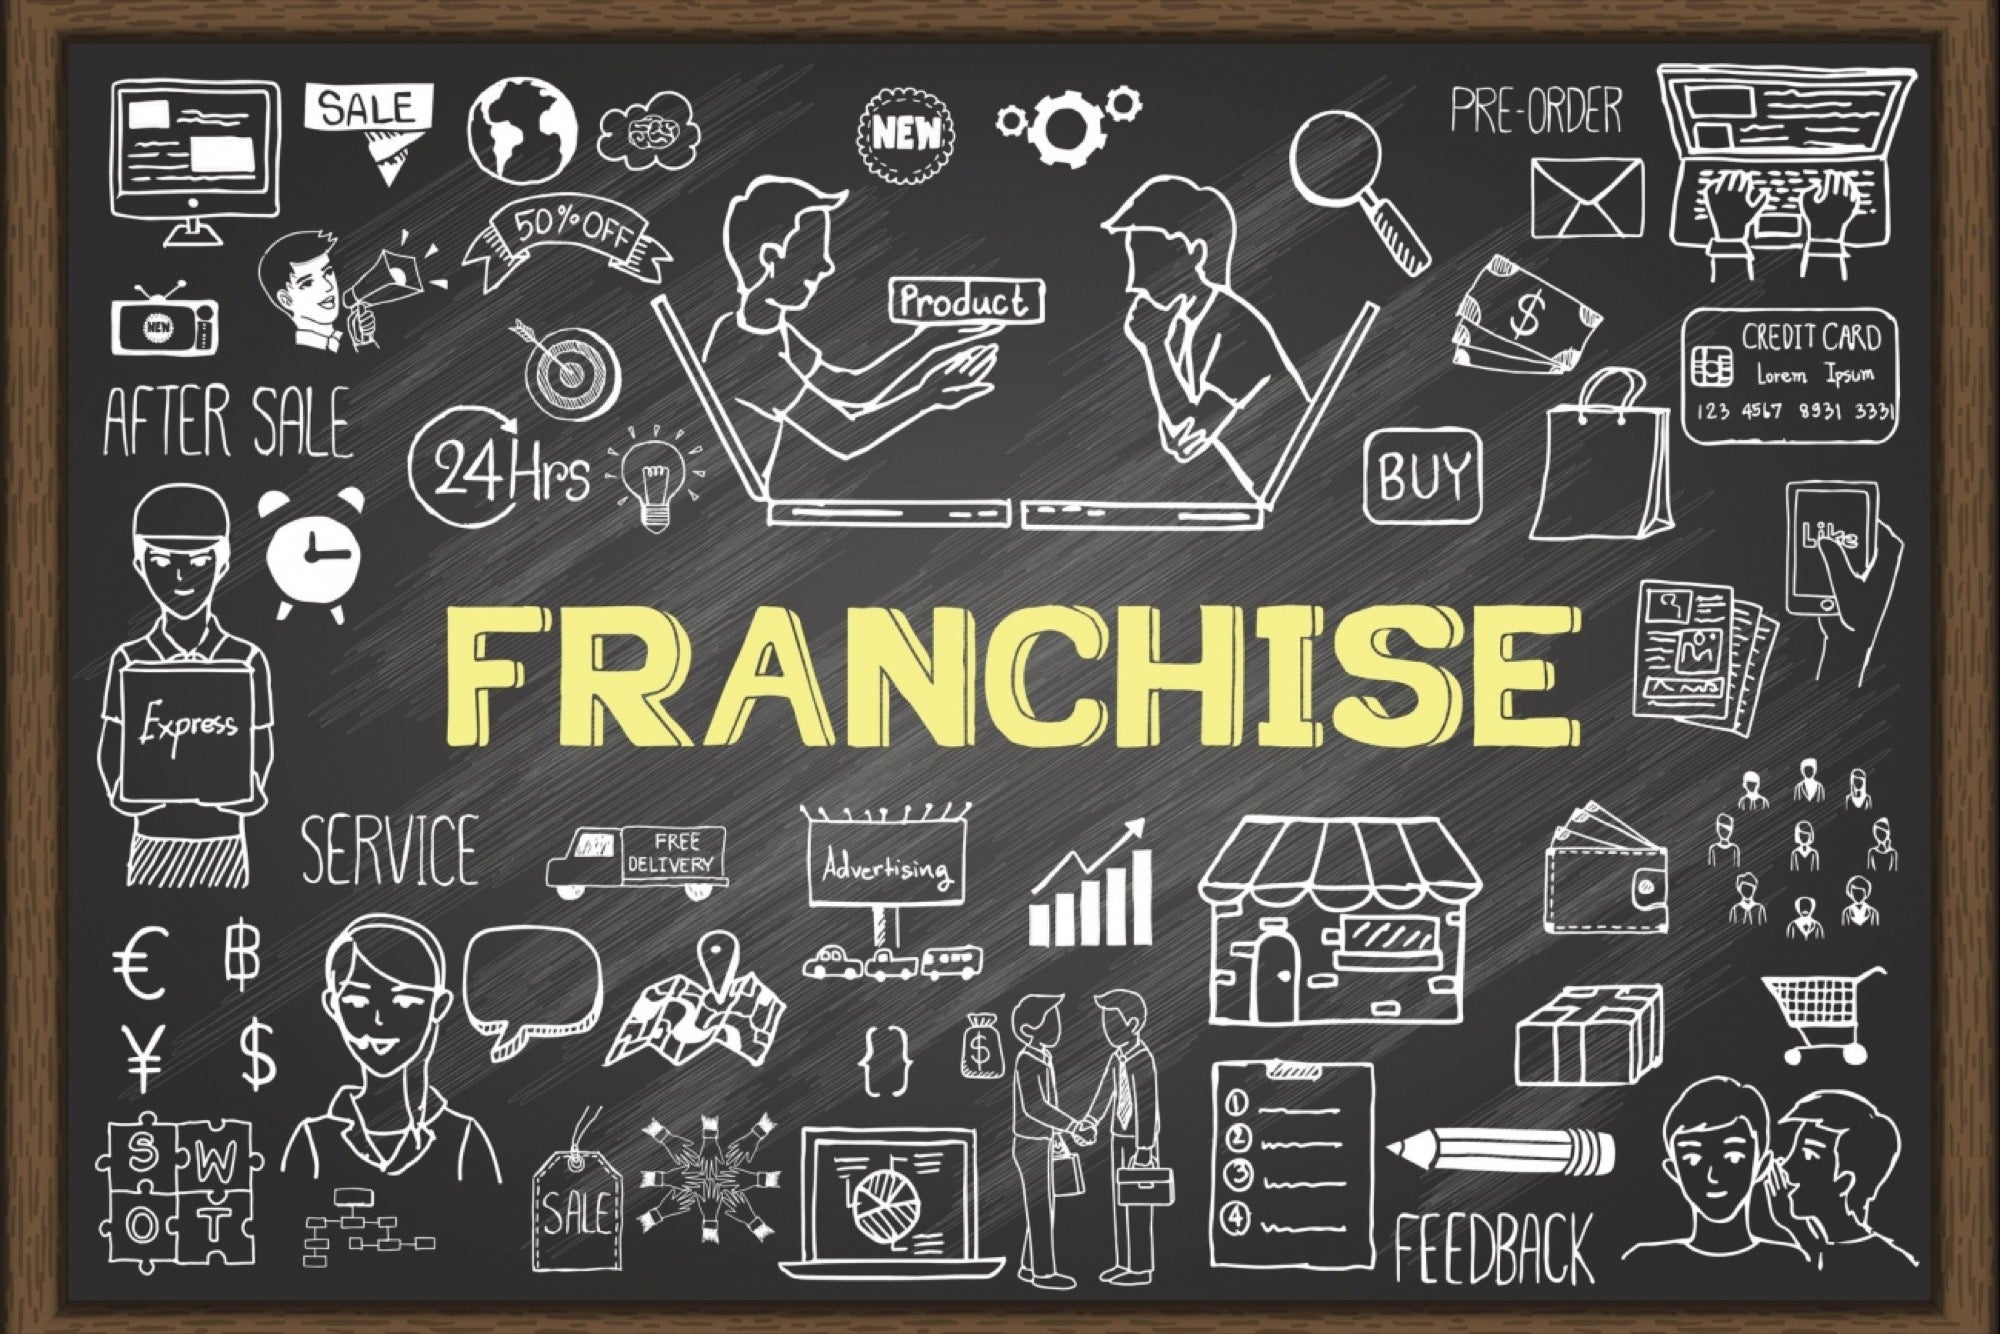 cheap franchises that make alot of money